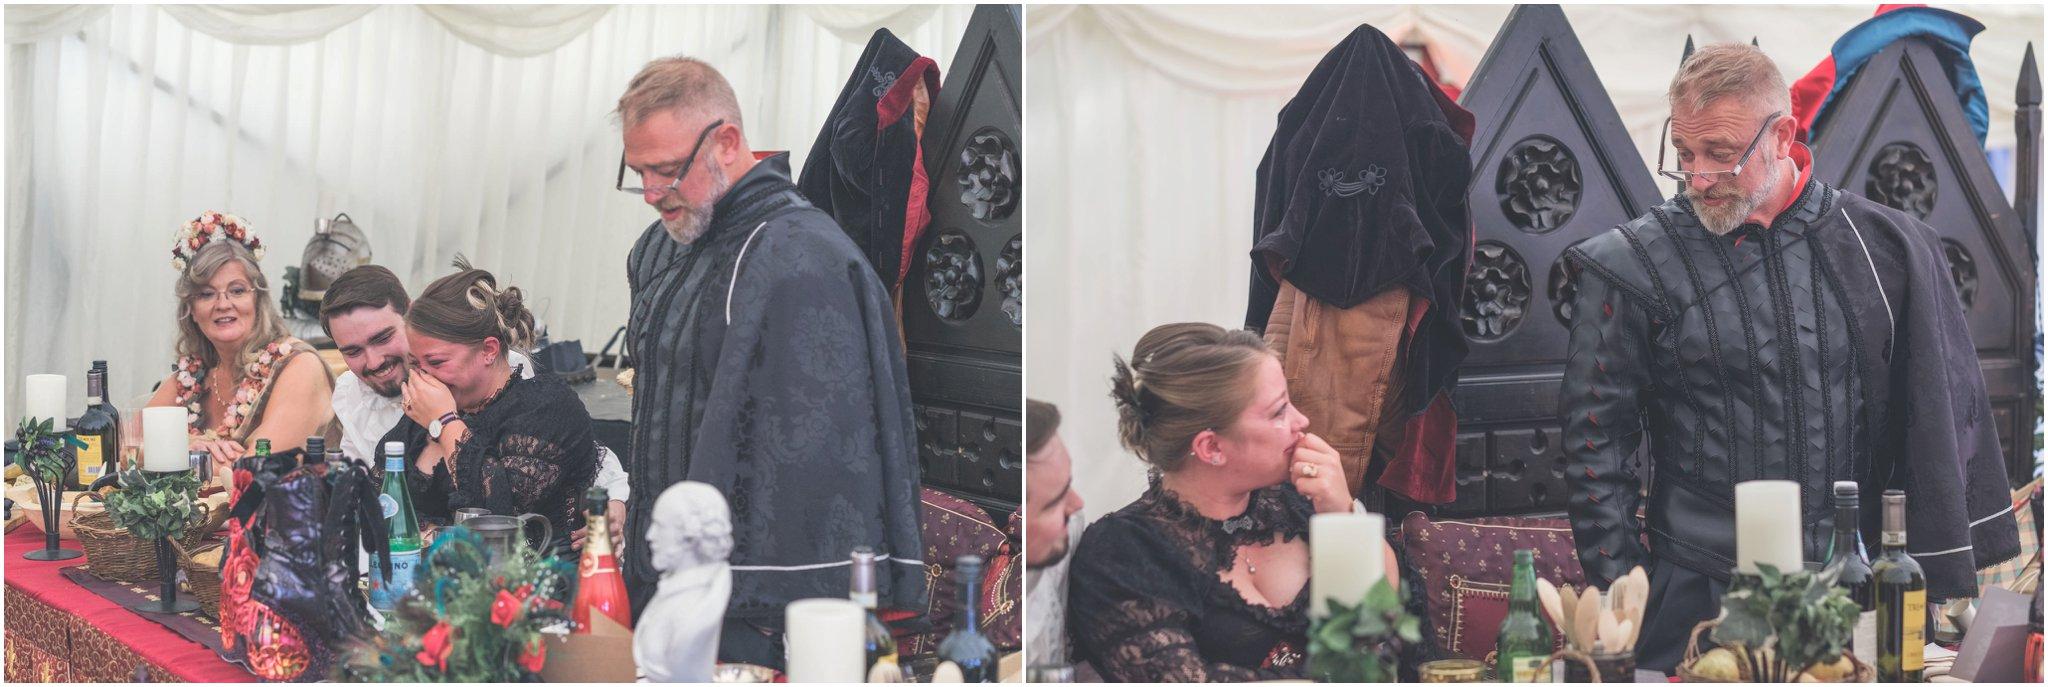 Stratford-Upon-Avon-Wedding - Robin Ball Photography-89.jpg